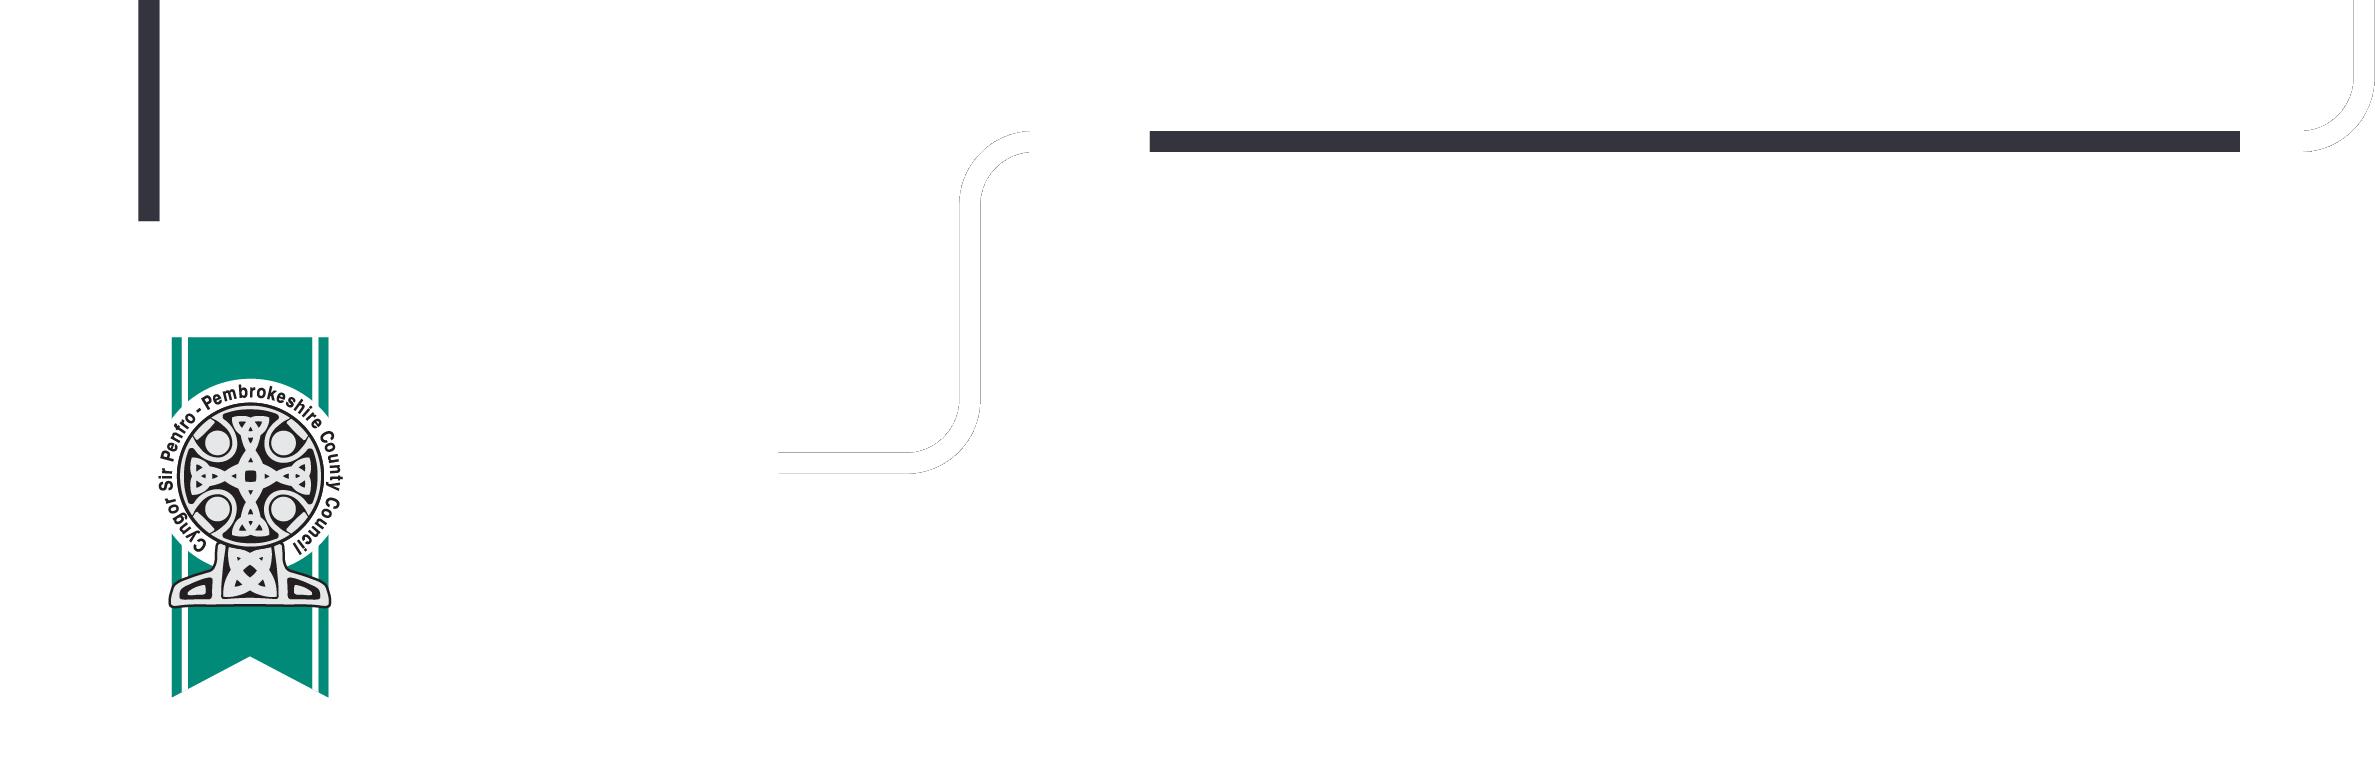 BUCANIER pembrokeshire logo